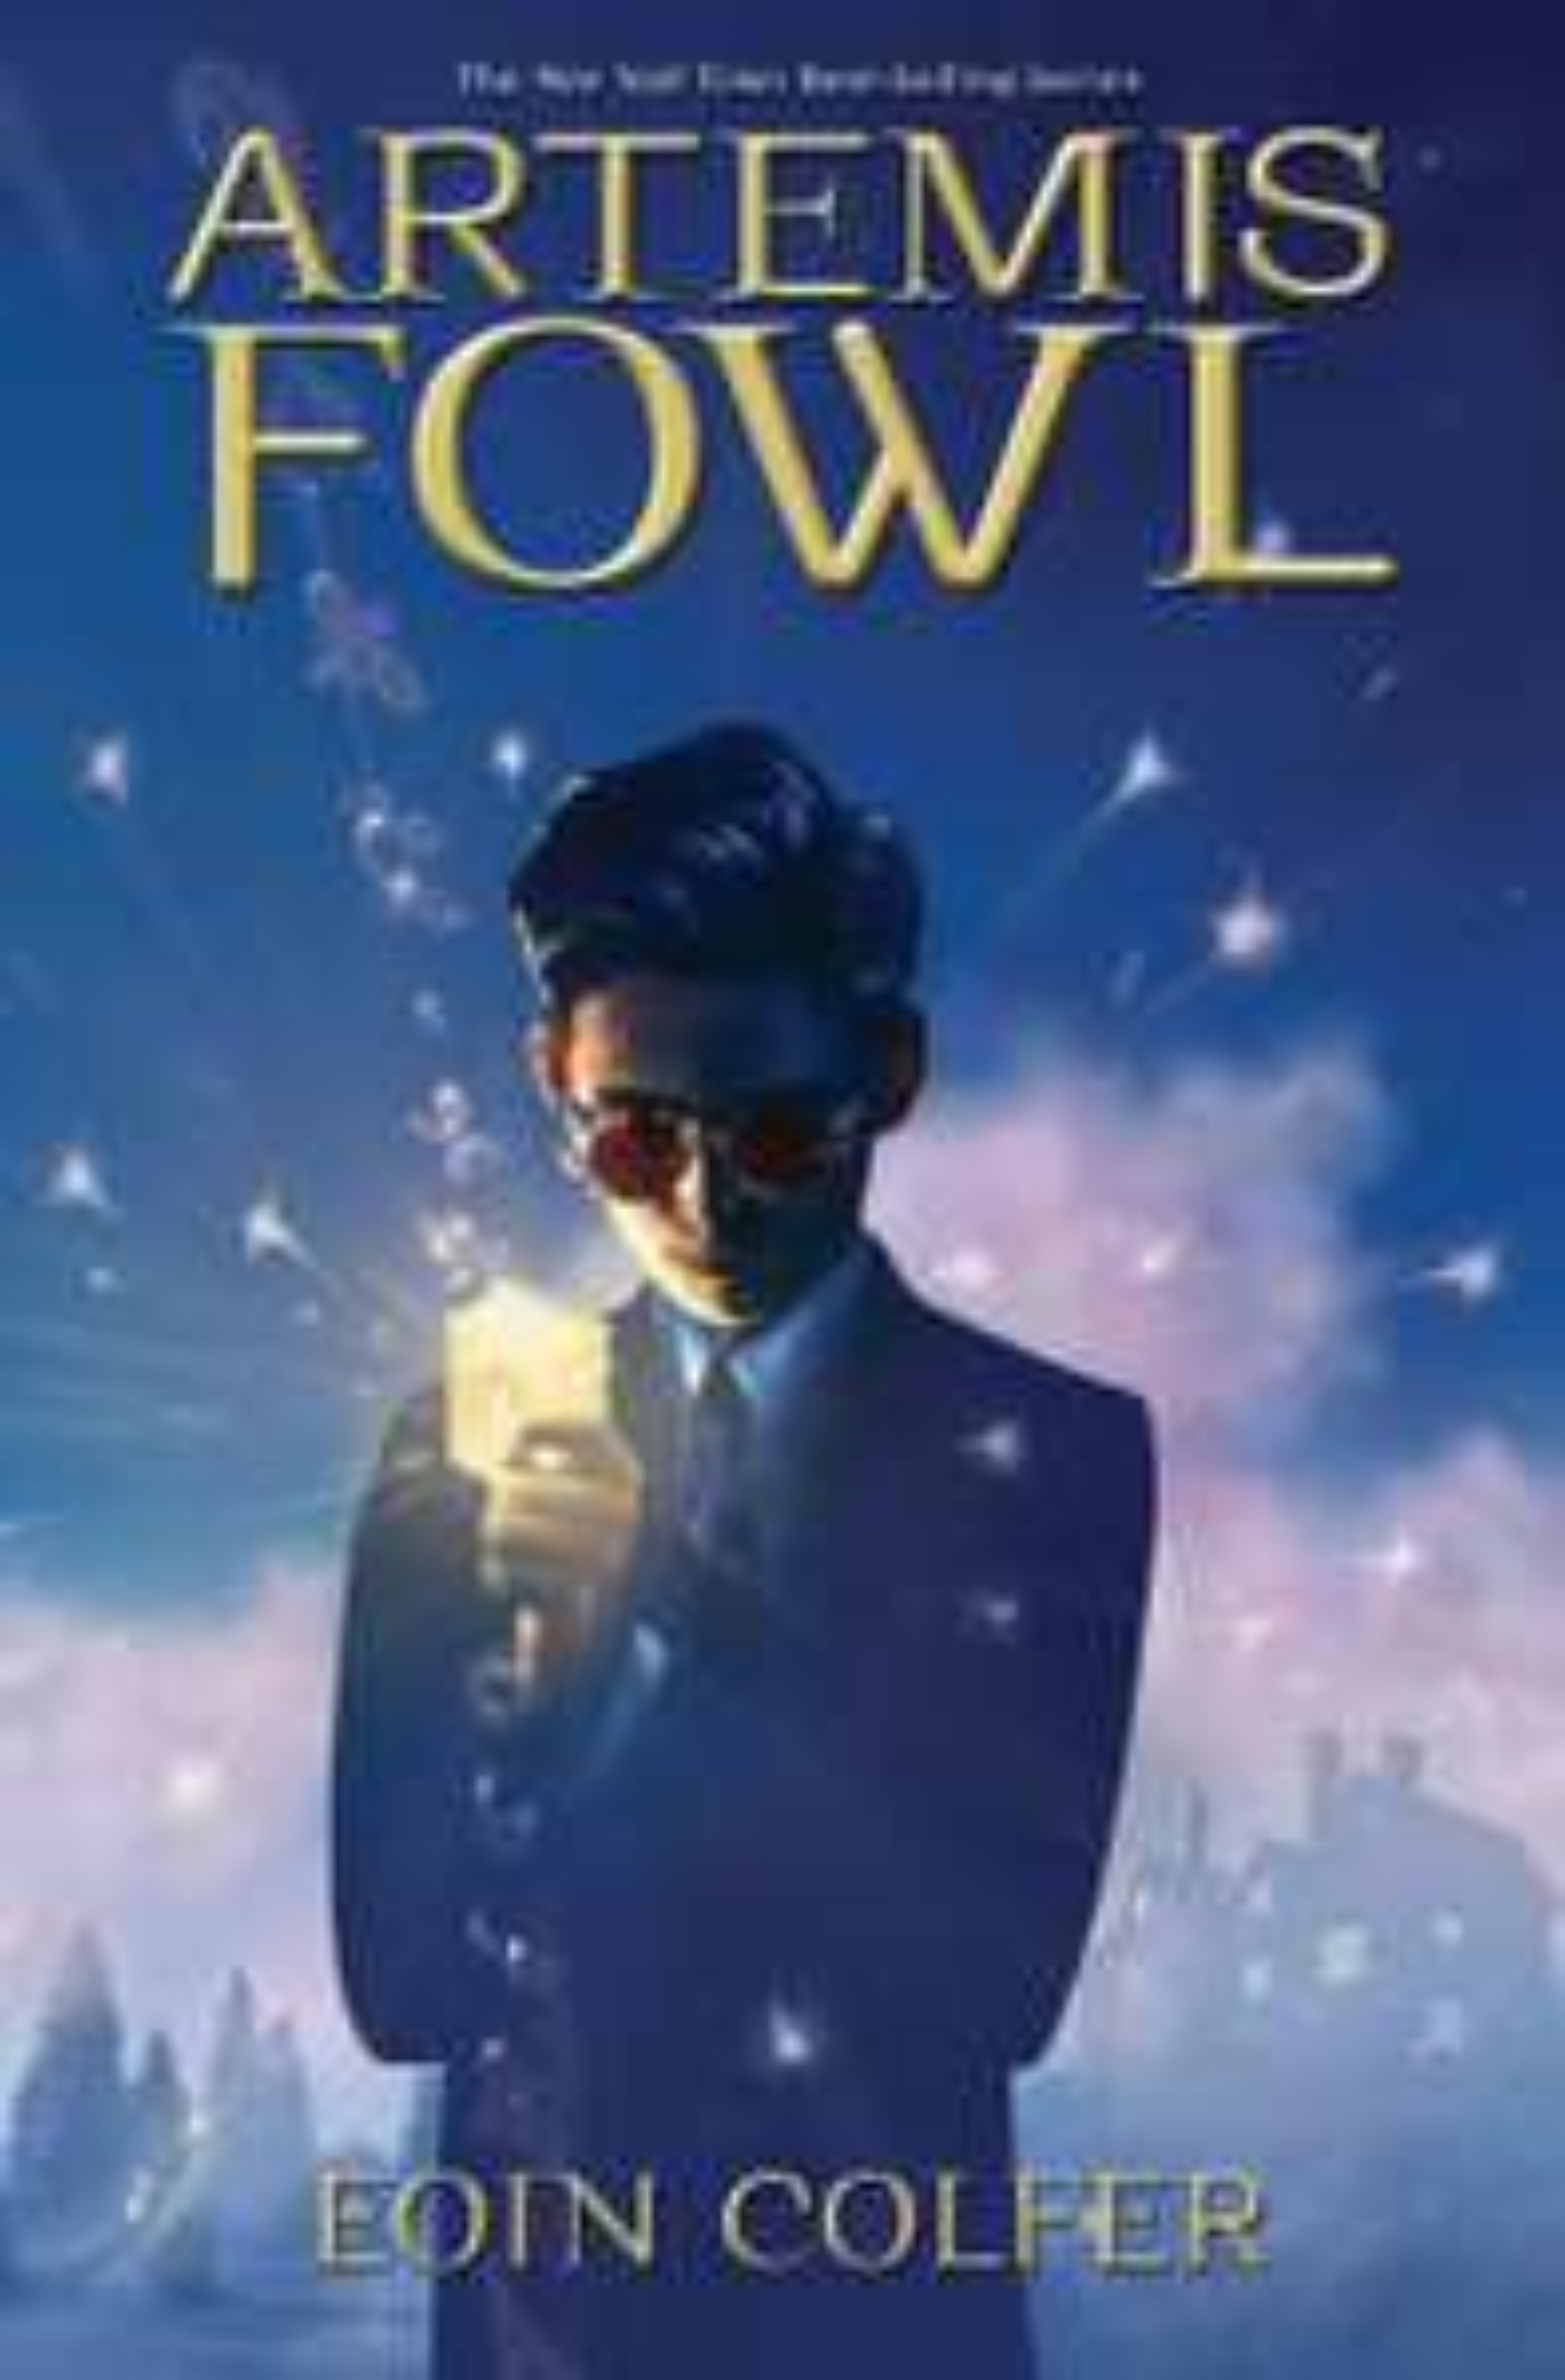 Eoin Colfer - Artemis Fowl - £1.99 @ Amazon UK (Kindle Edition)